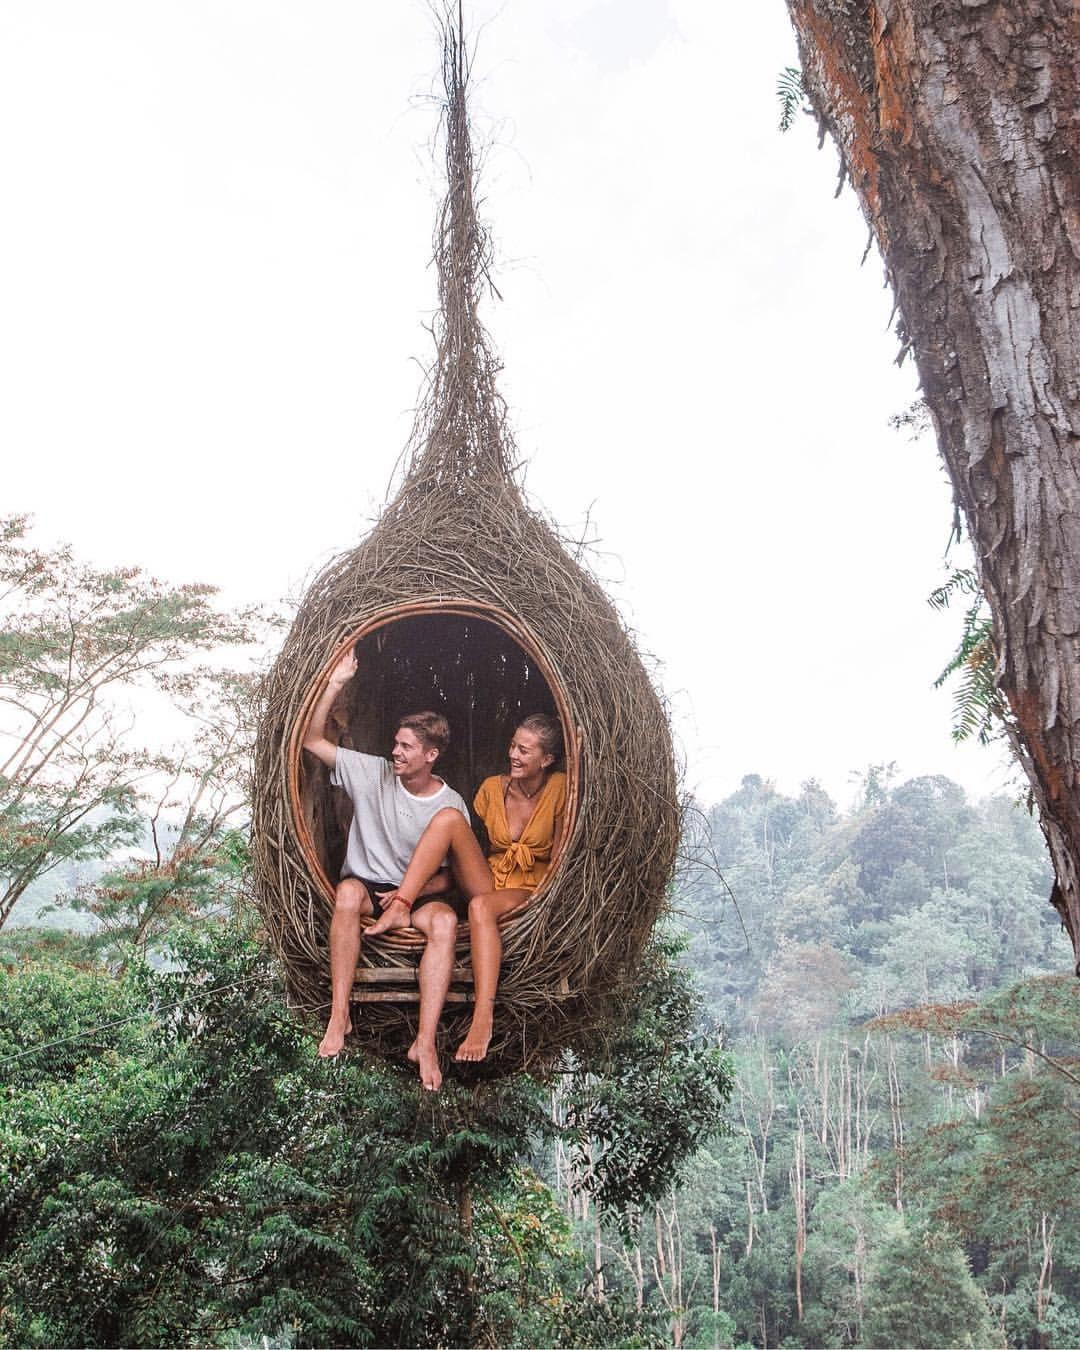 Wanagiri Hidden Hill Munduk Bedugul Bali Indonesia - Wanderers & Warriors - Charlie & Lauren UK Travel Couple - Instagram Spots Bali - Birds Nest Bali